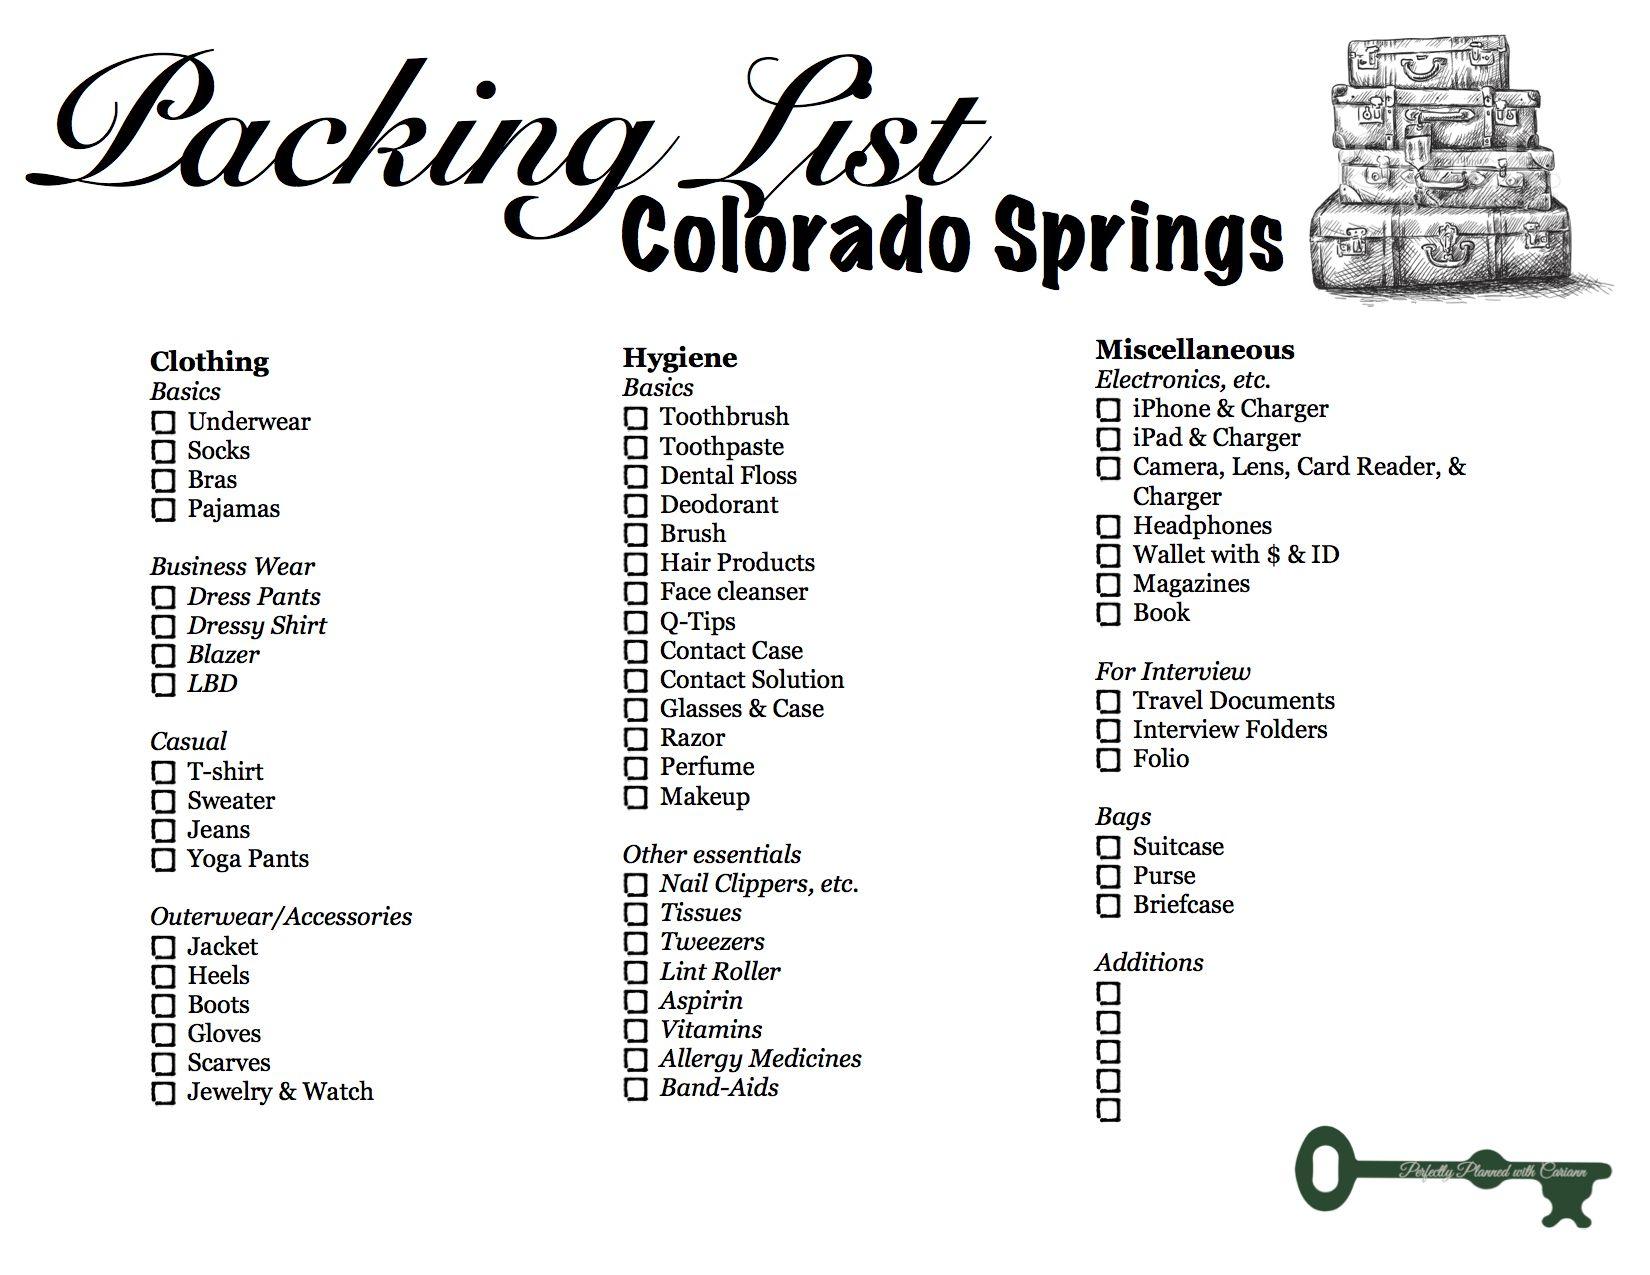 Packing List Colorado Springs